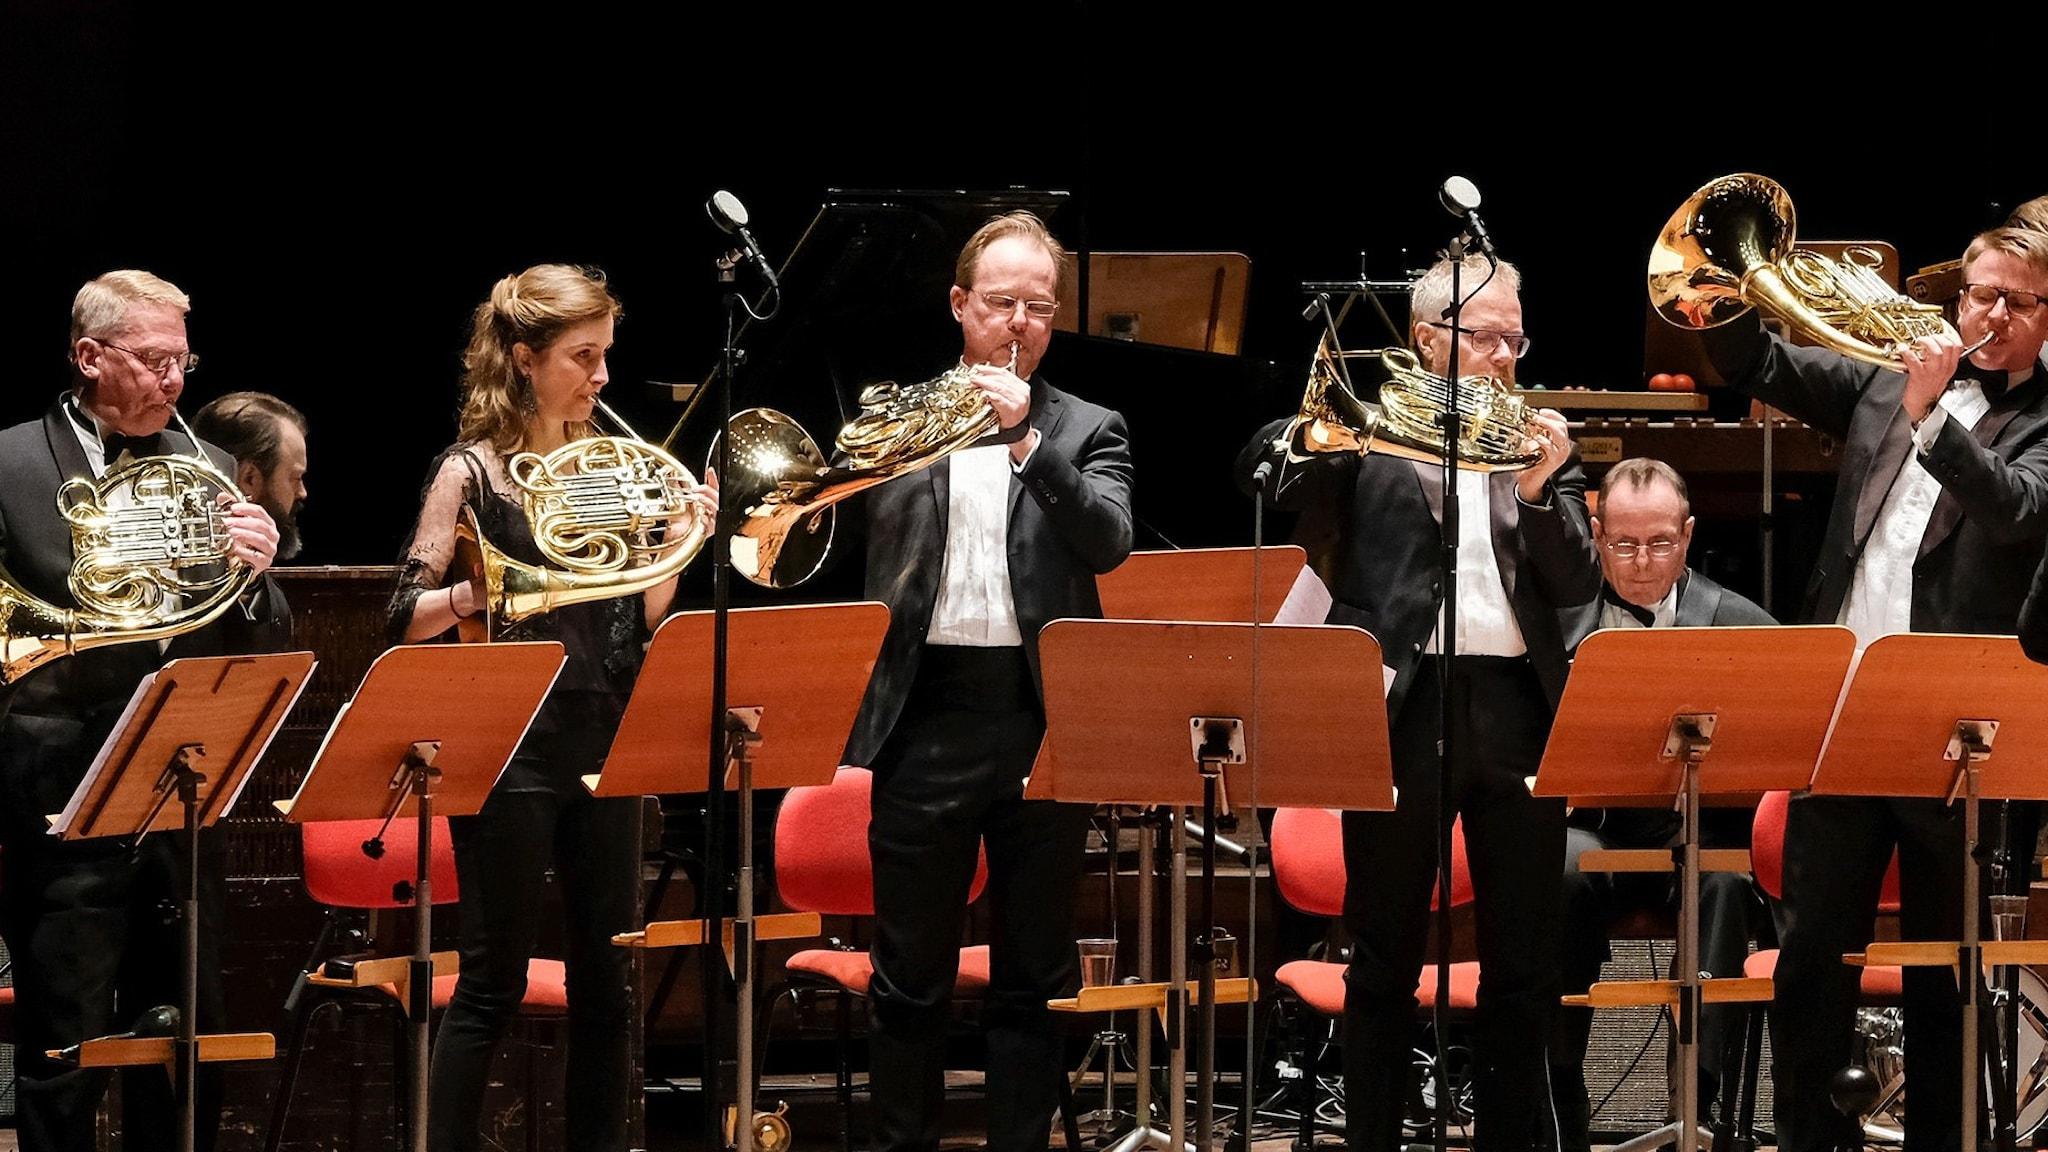 Sveriges Radios symfoniorkesters brass.